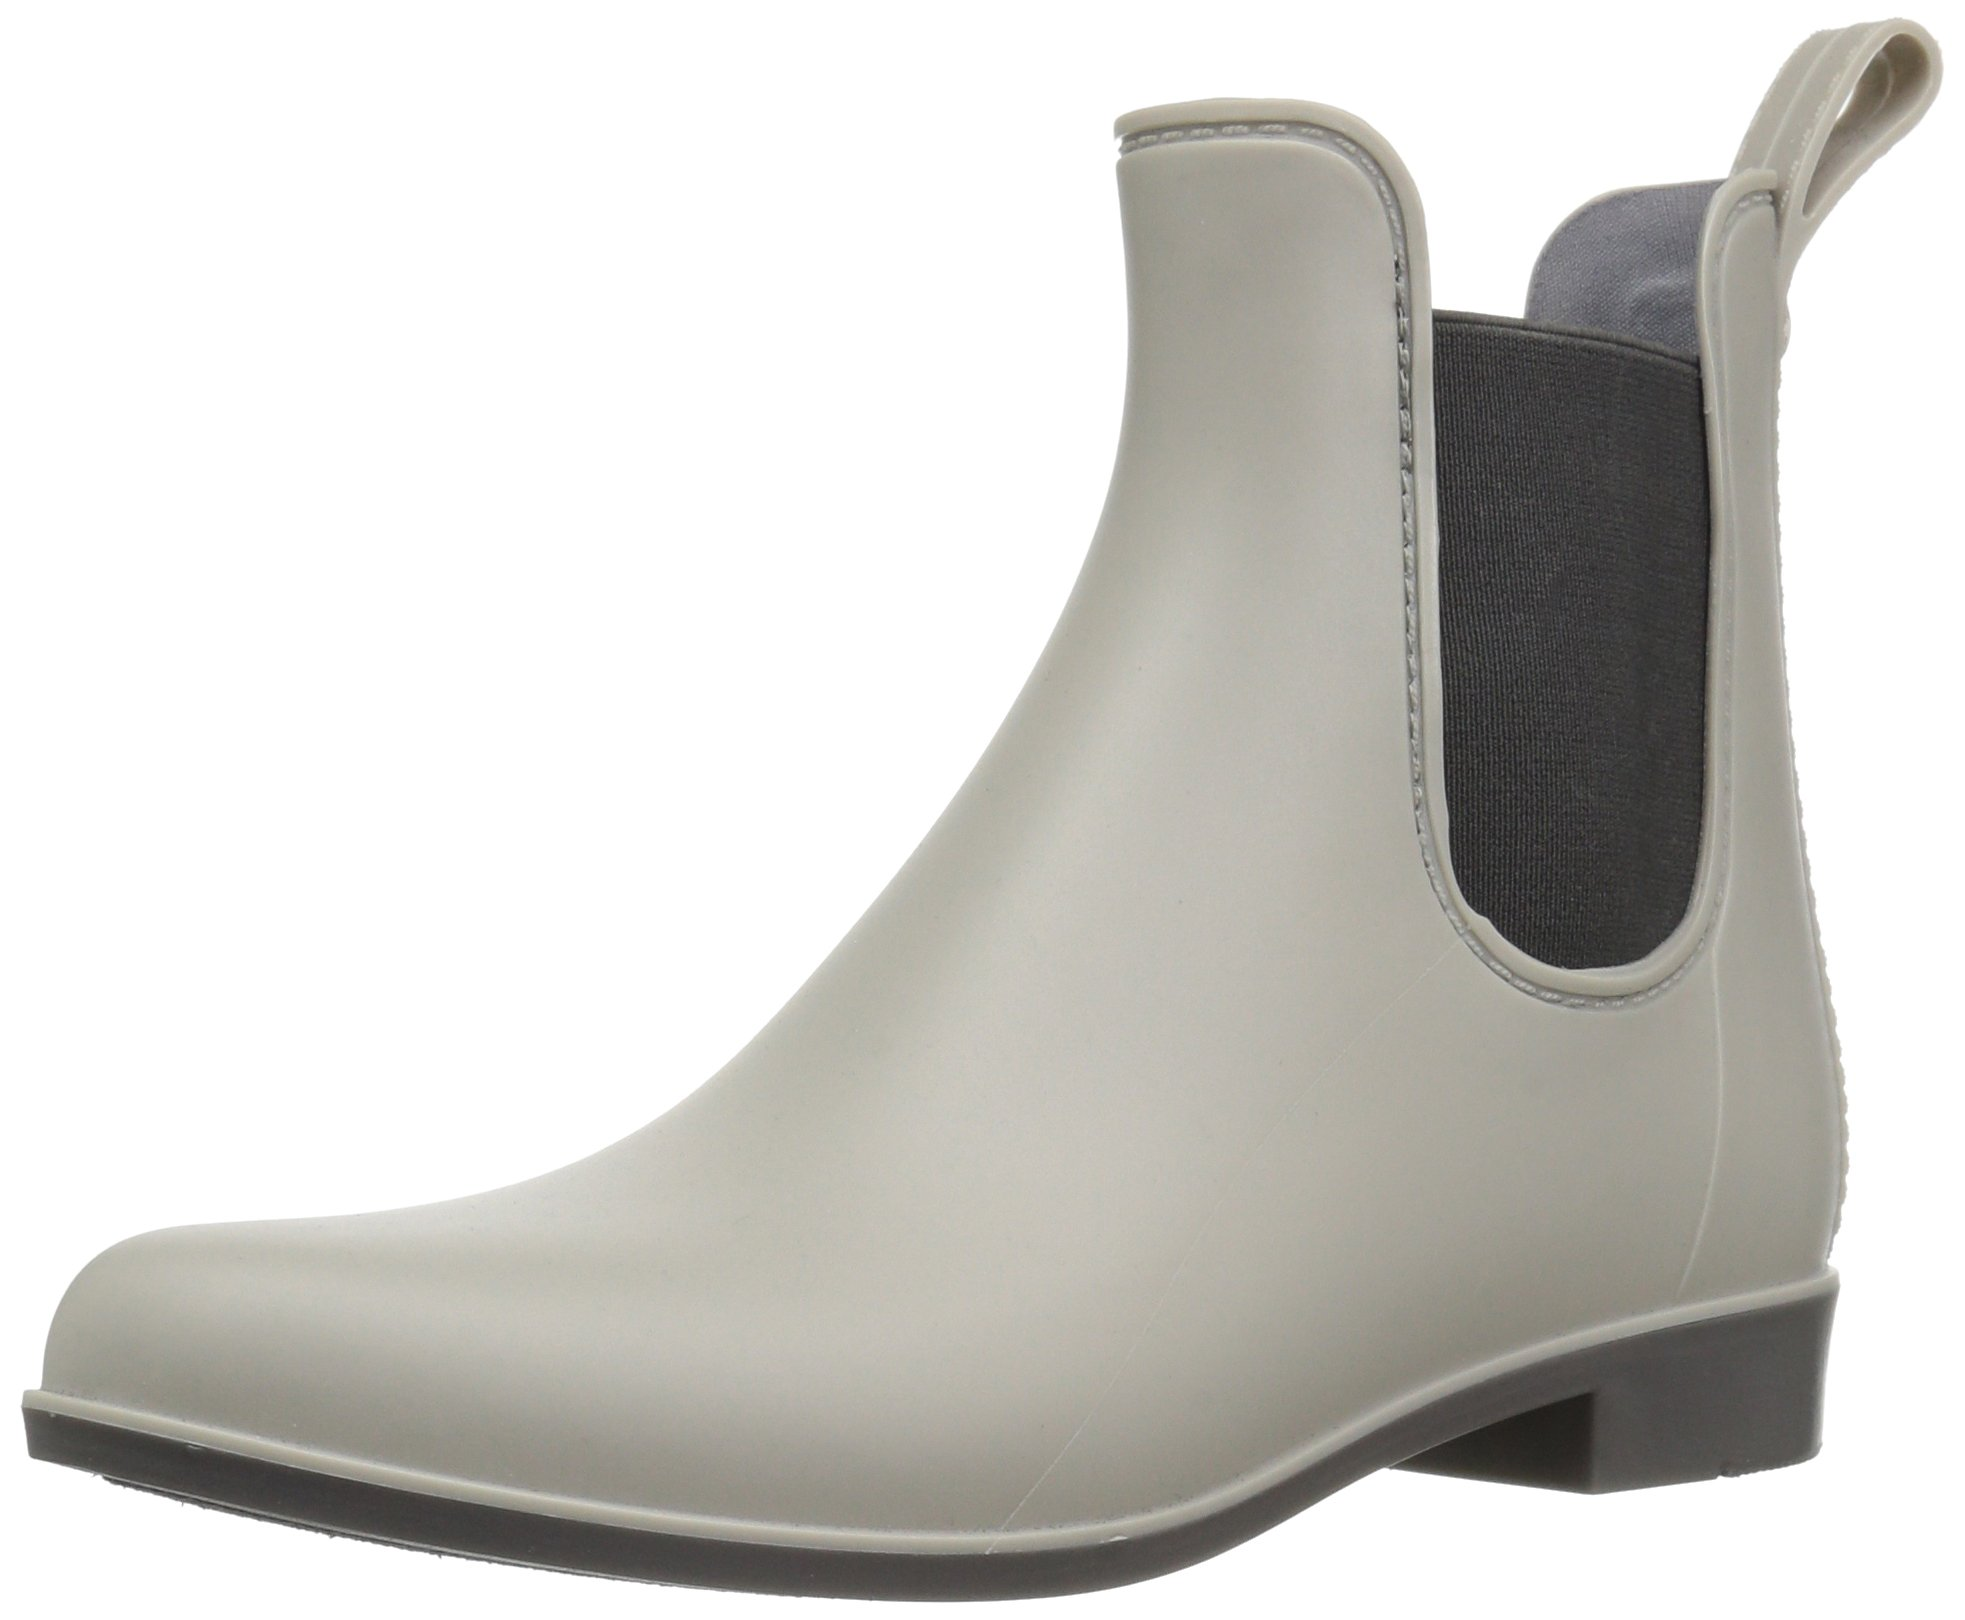 Sam Edelman Women's Tinsley Rain Boot, Dove Grey, 8 M US